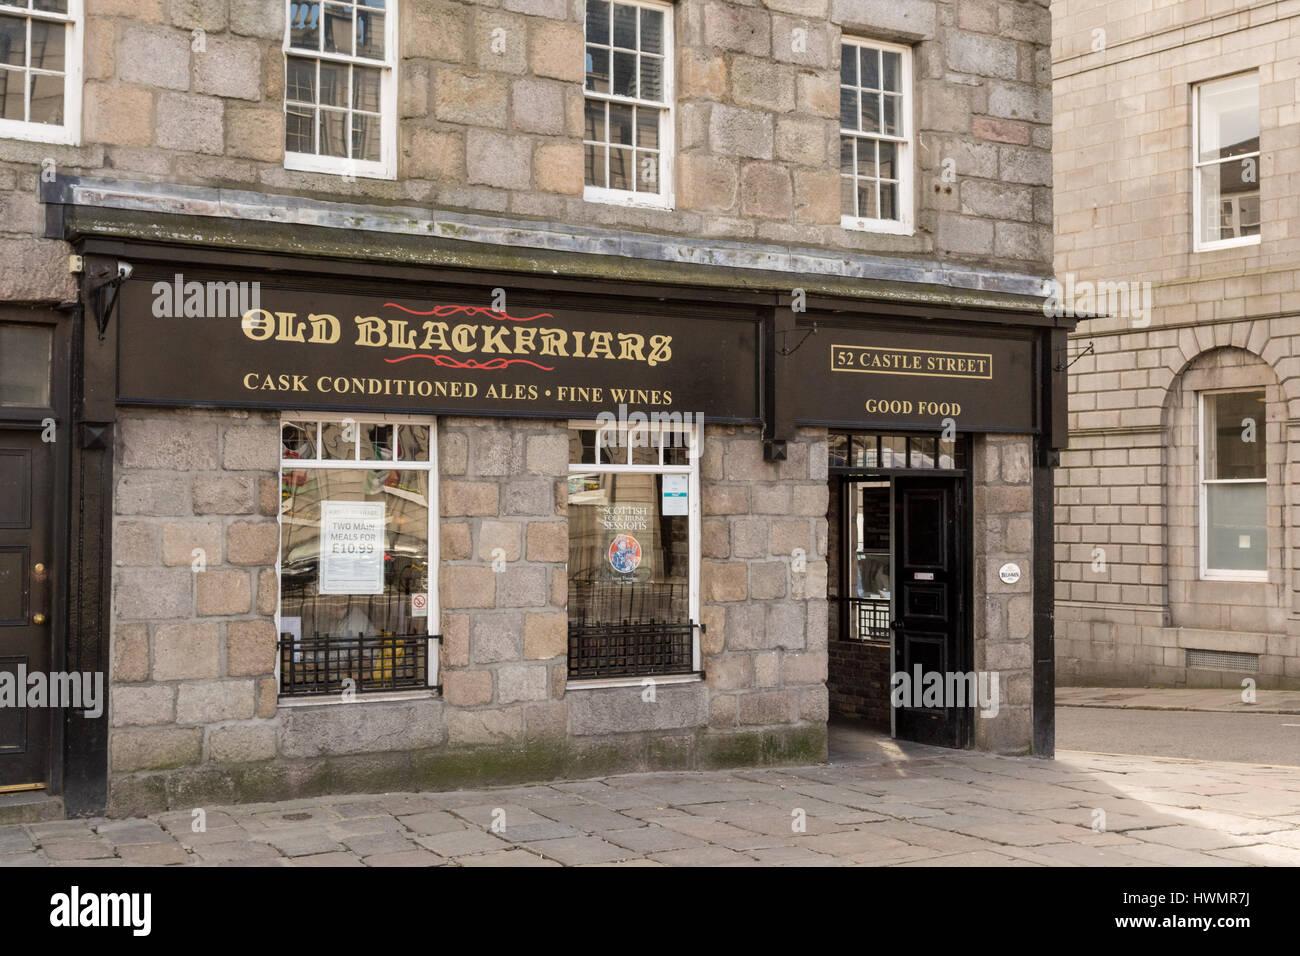 Old Blackfriars Pub, Castlegate, Aberdeen, Scotland, UK - Stock Image